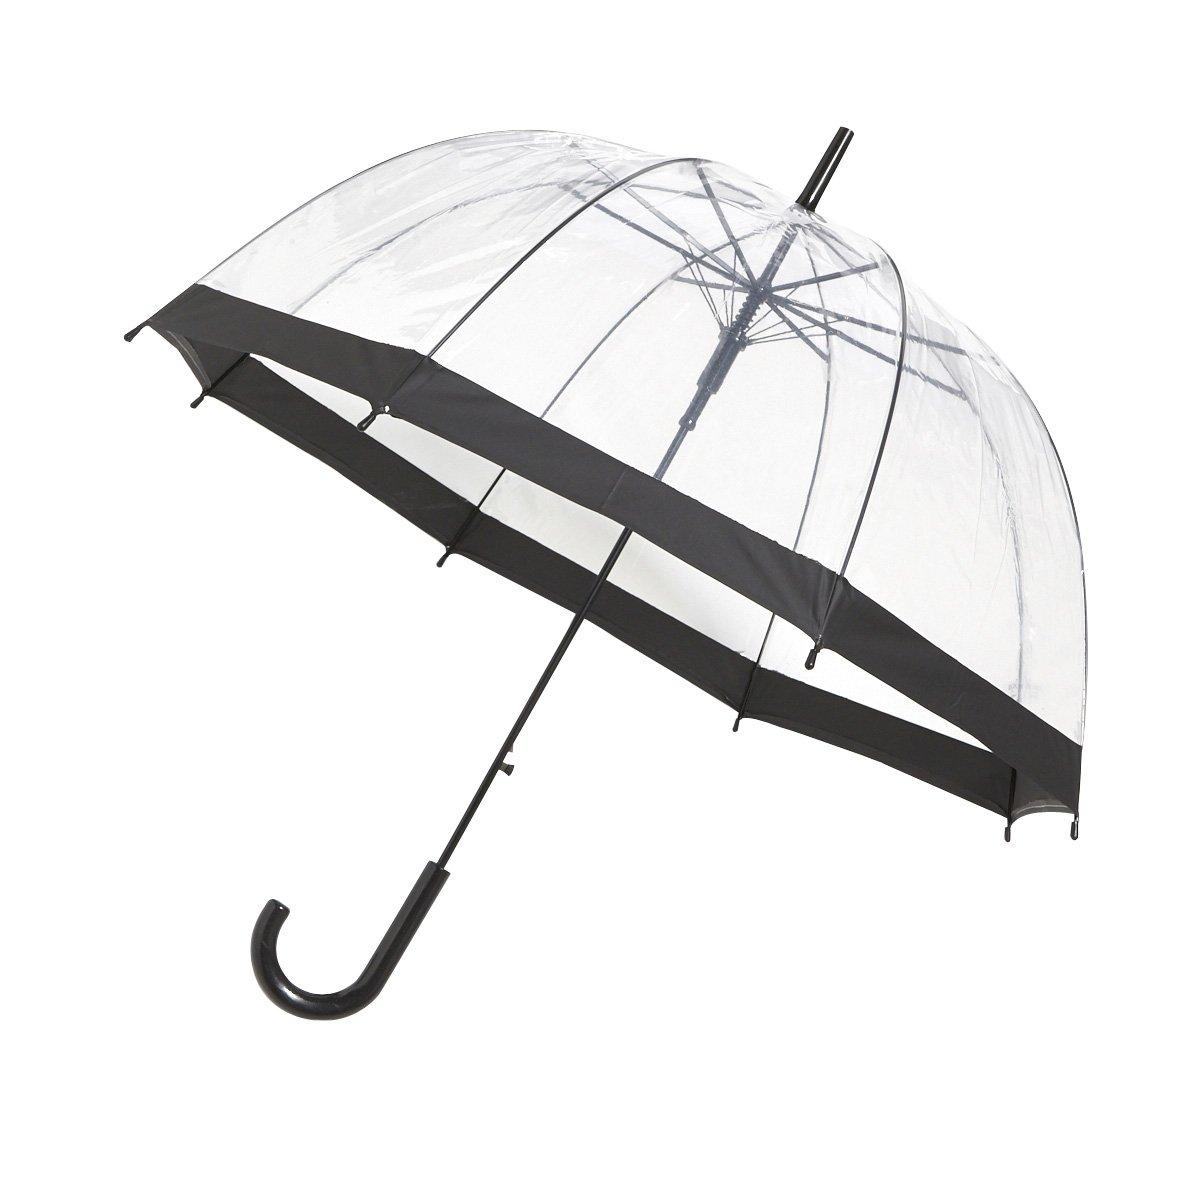 Paraguas Automatico Transparente en forma de cupula con borde negro Ambiance-Live Group